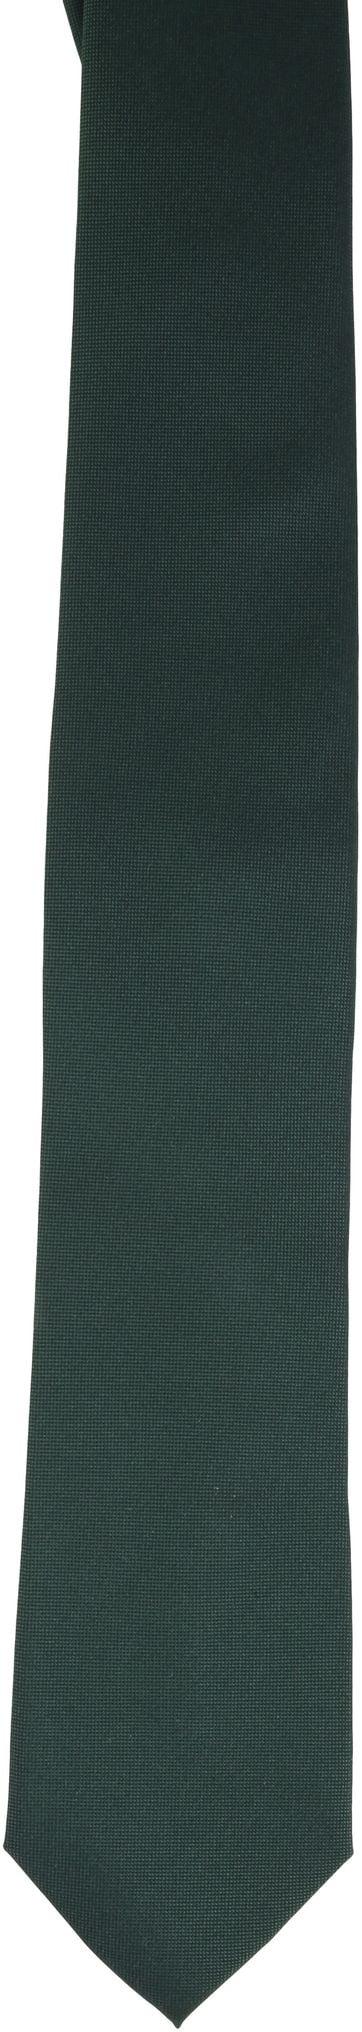 Silk Tie Green K81-22